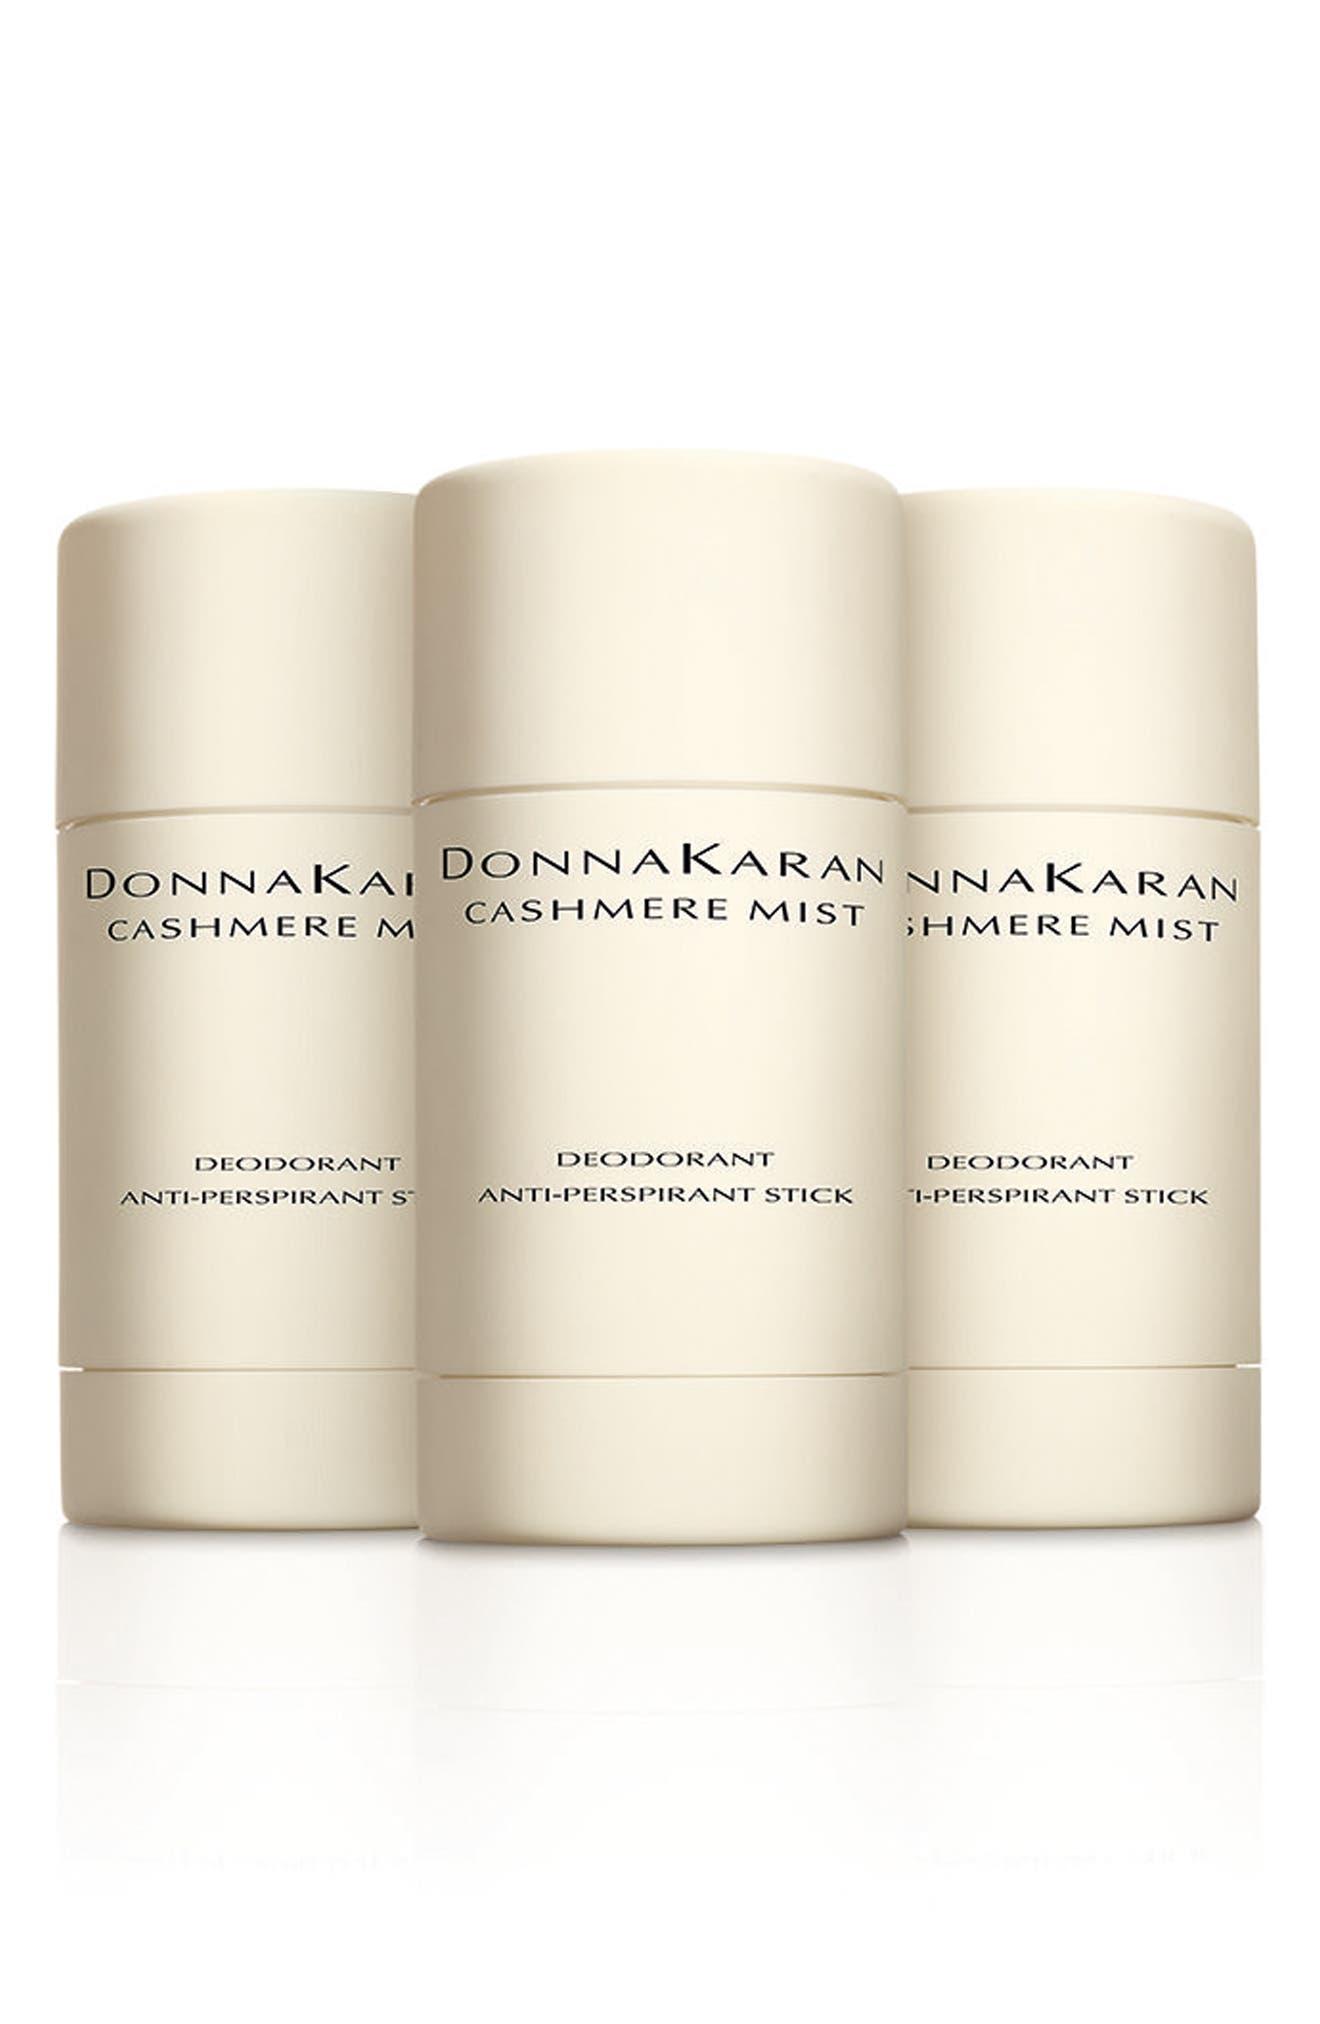 Donna Karan Cashmere Mist Deodorant Trio,                         Main,                         color, 000